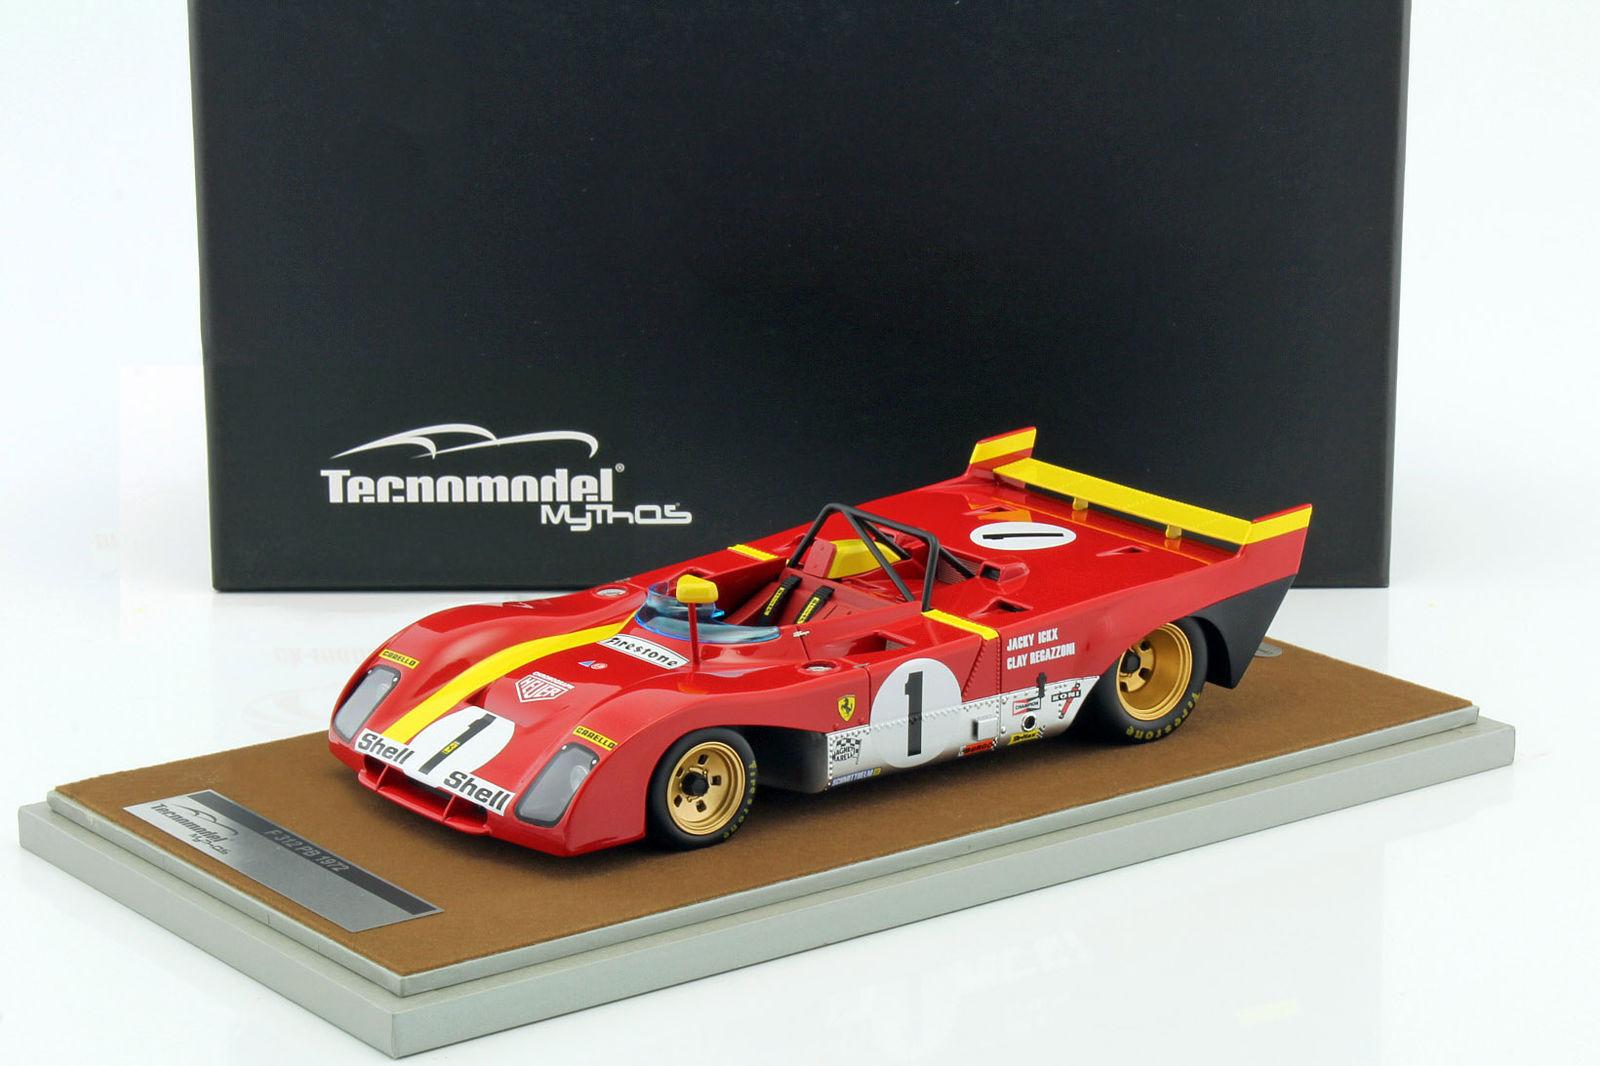 Ferrari 312 pb 1 ganador pelaRegazzoni Limited 100PC  por Tecnomodel TM18-62C